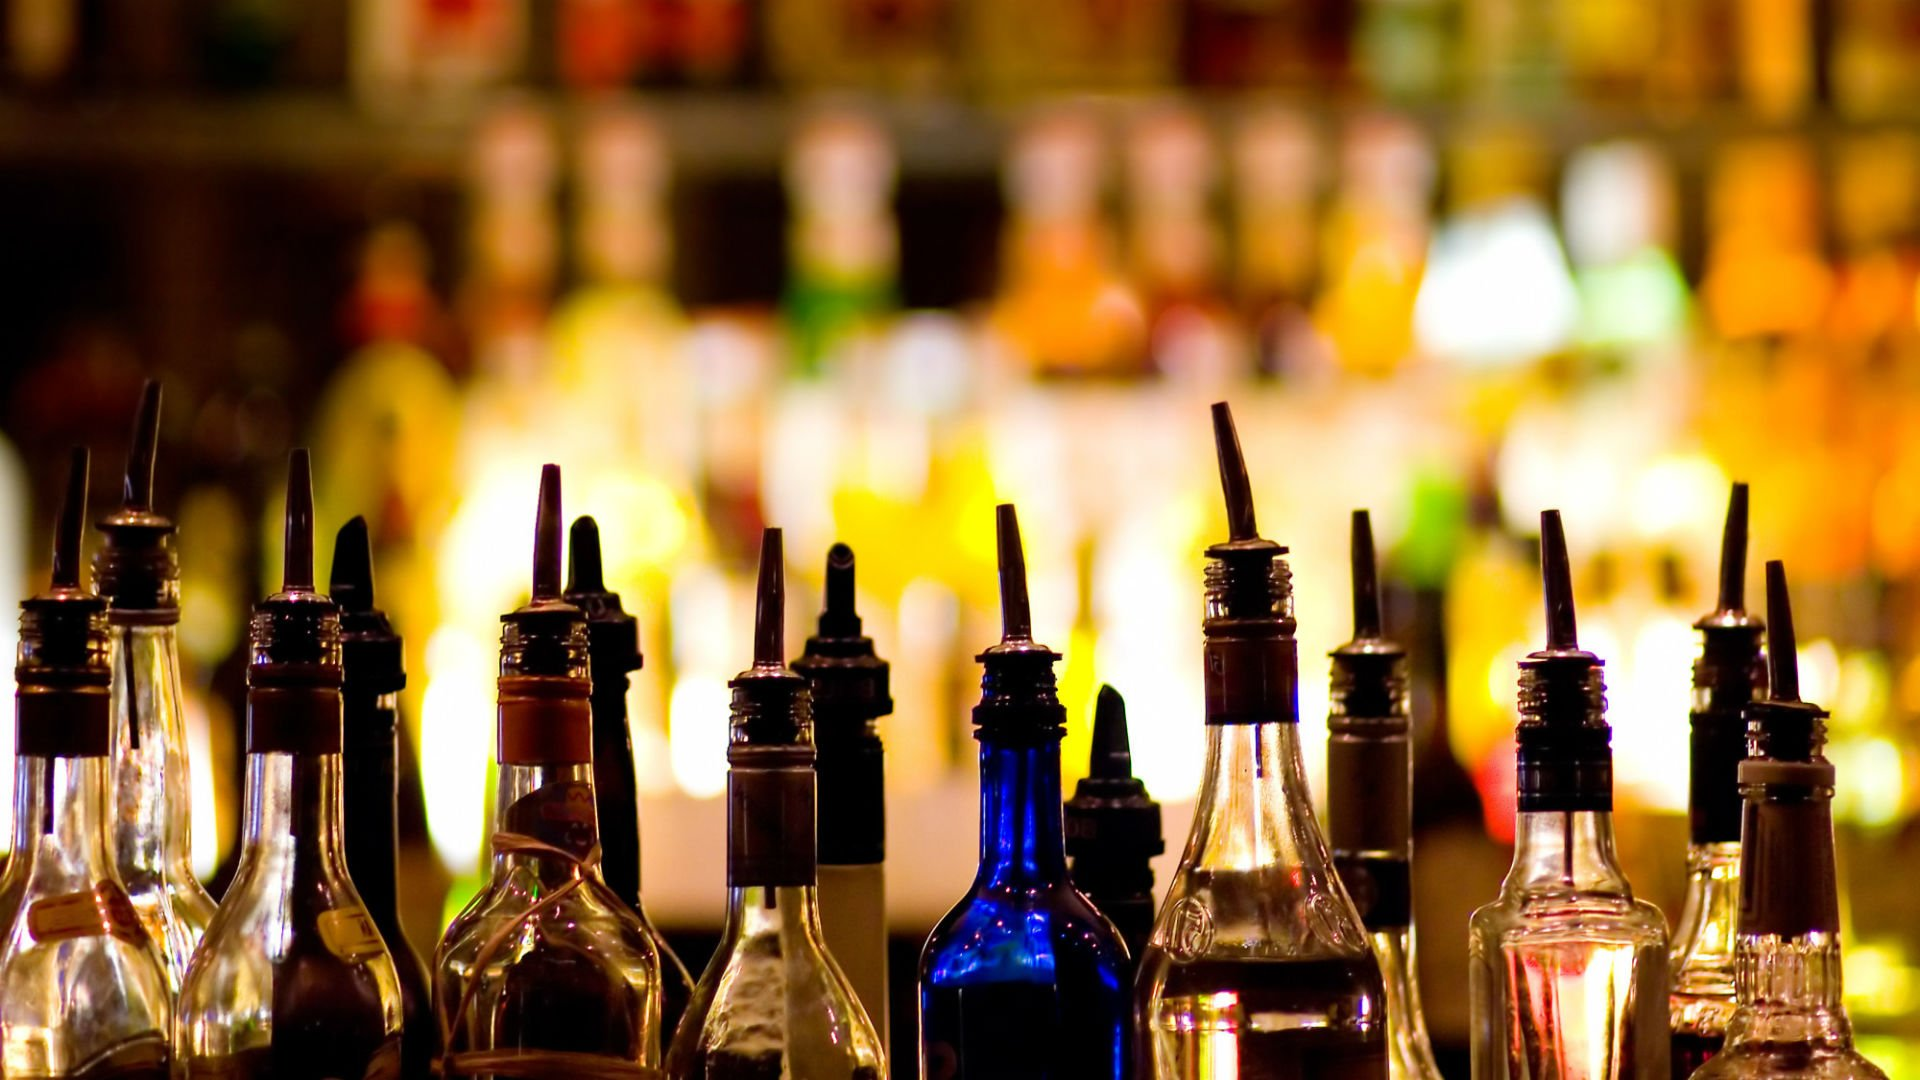 Liquor Alcohol Drink Drinks Bottle Glass Cocktail